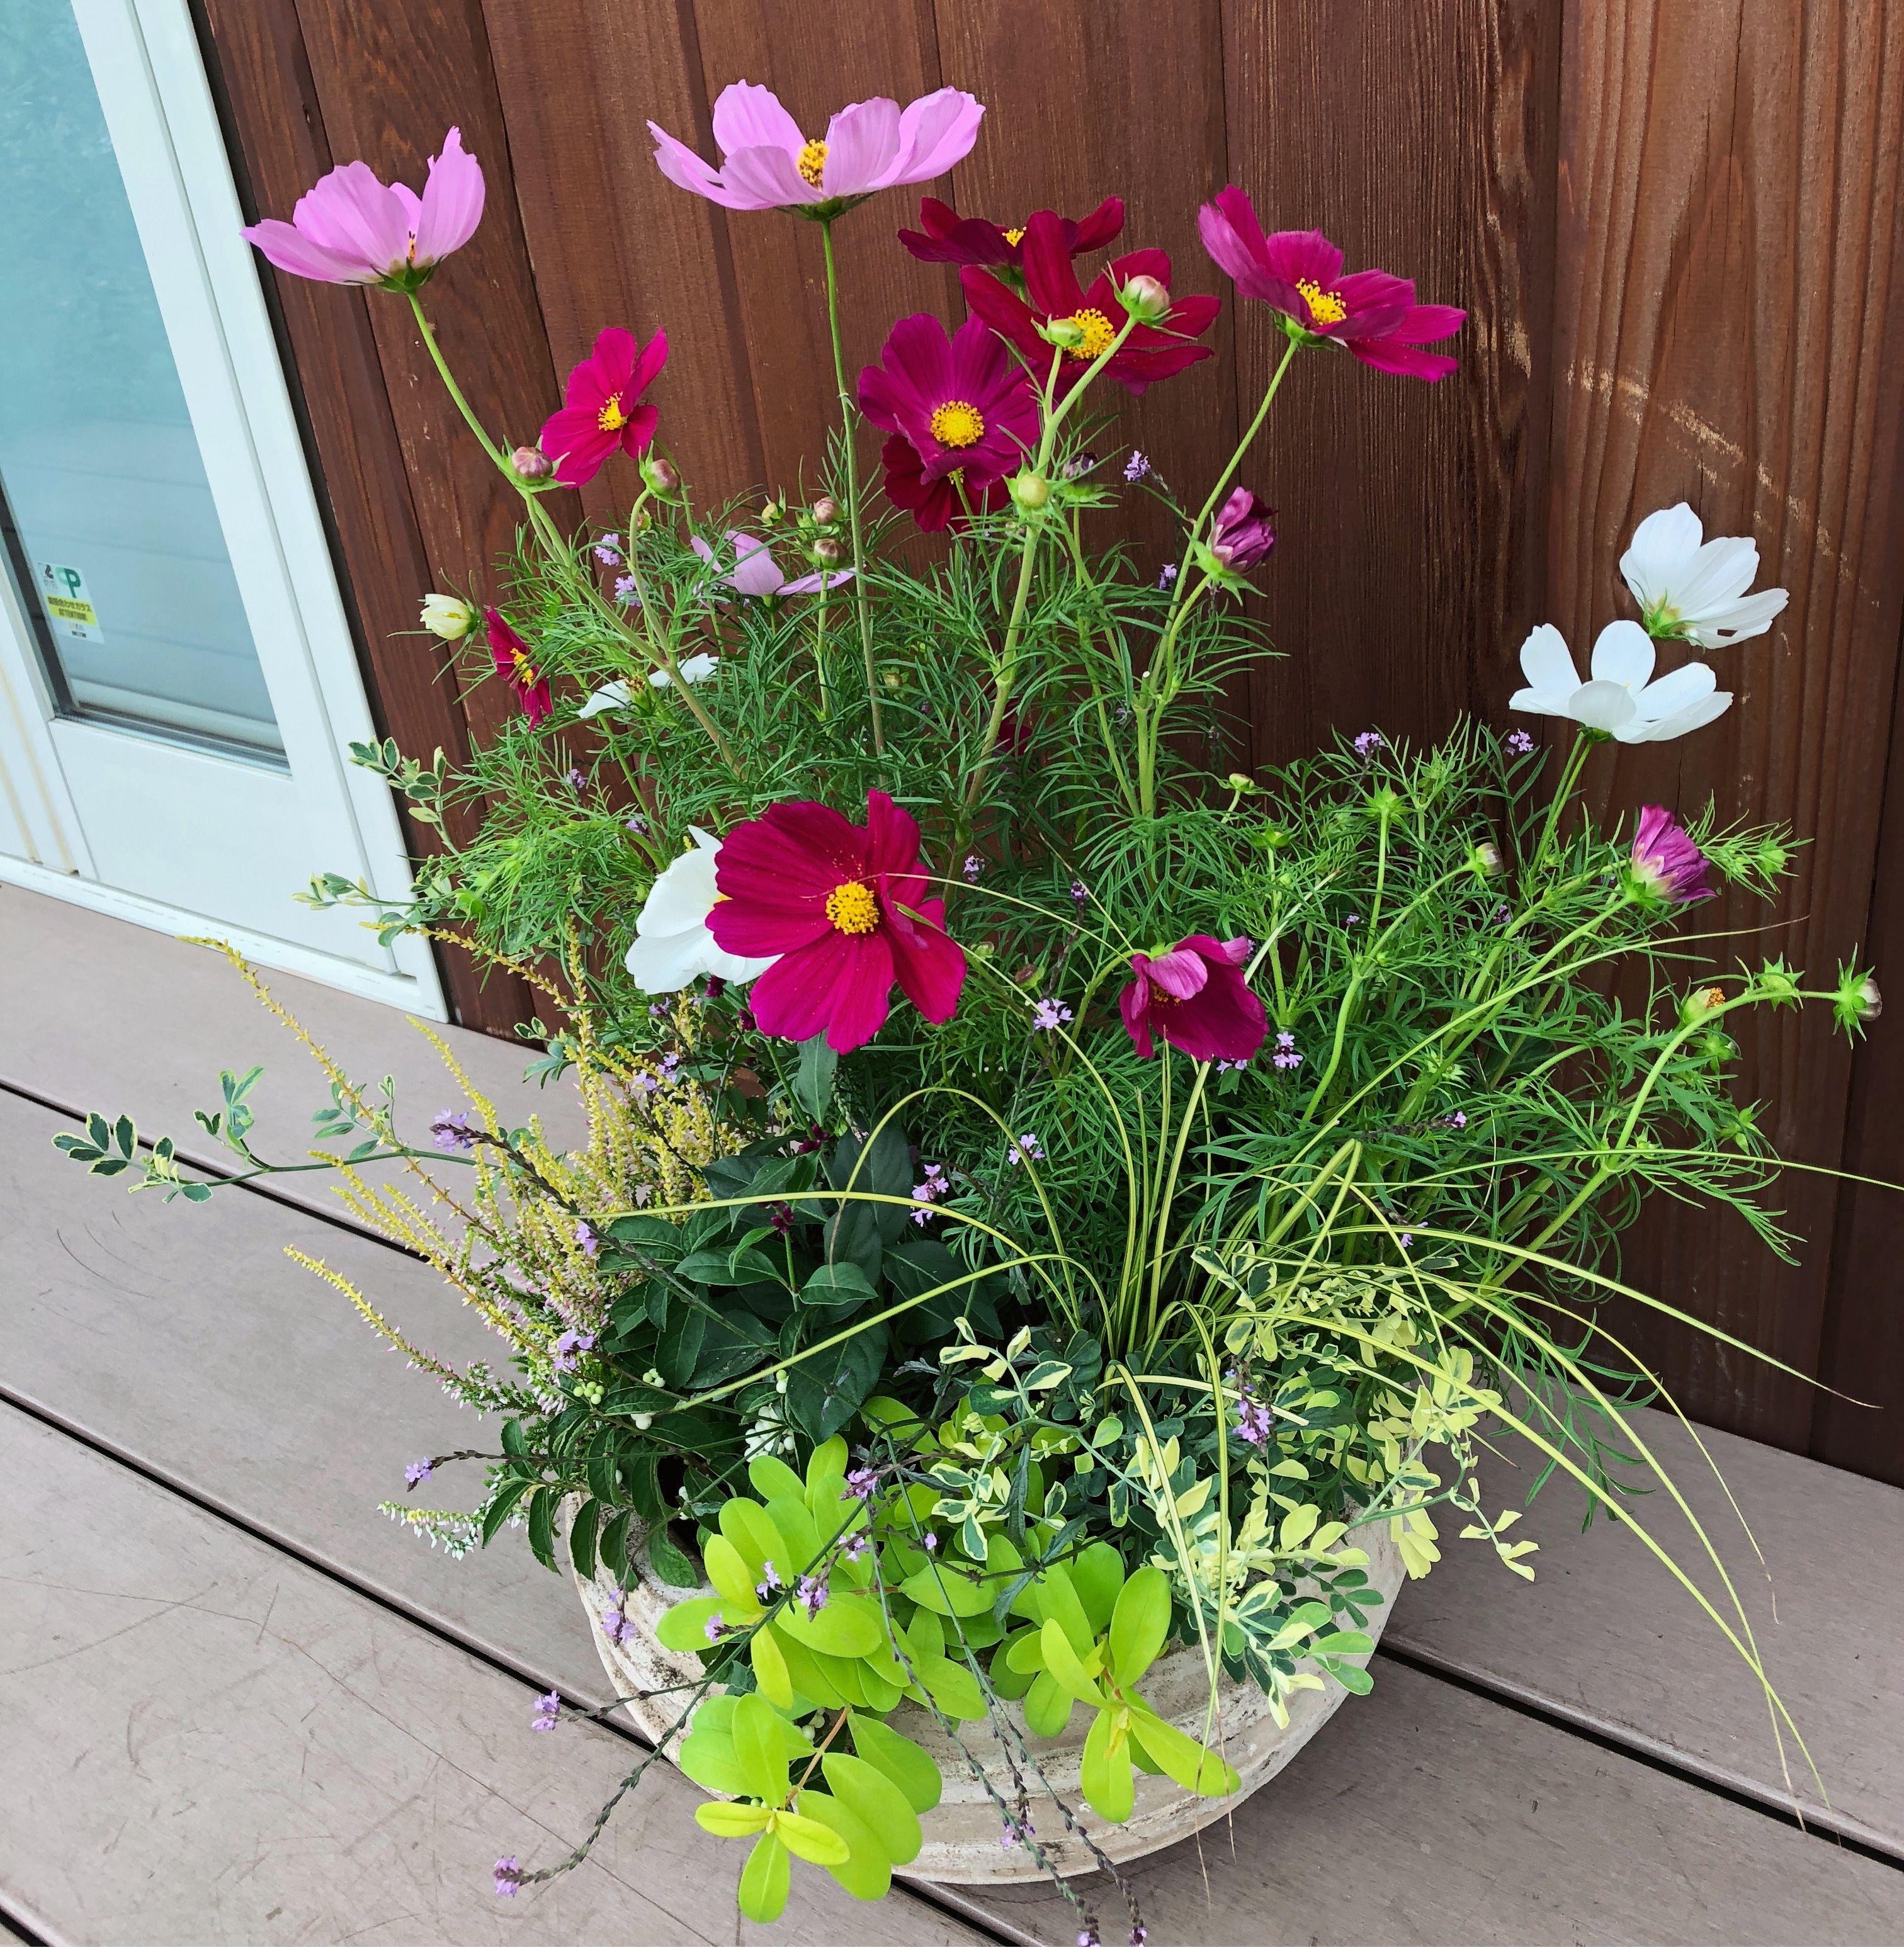 Planting Designer Cosmos Shadecontainergardeningideas Garden Yard Ideas Container Gardening Plants